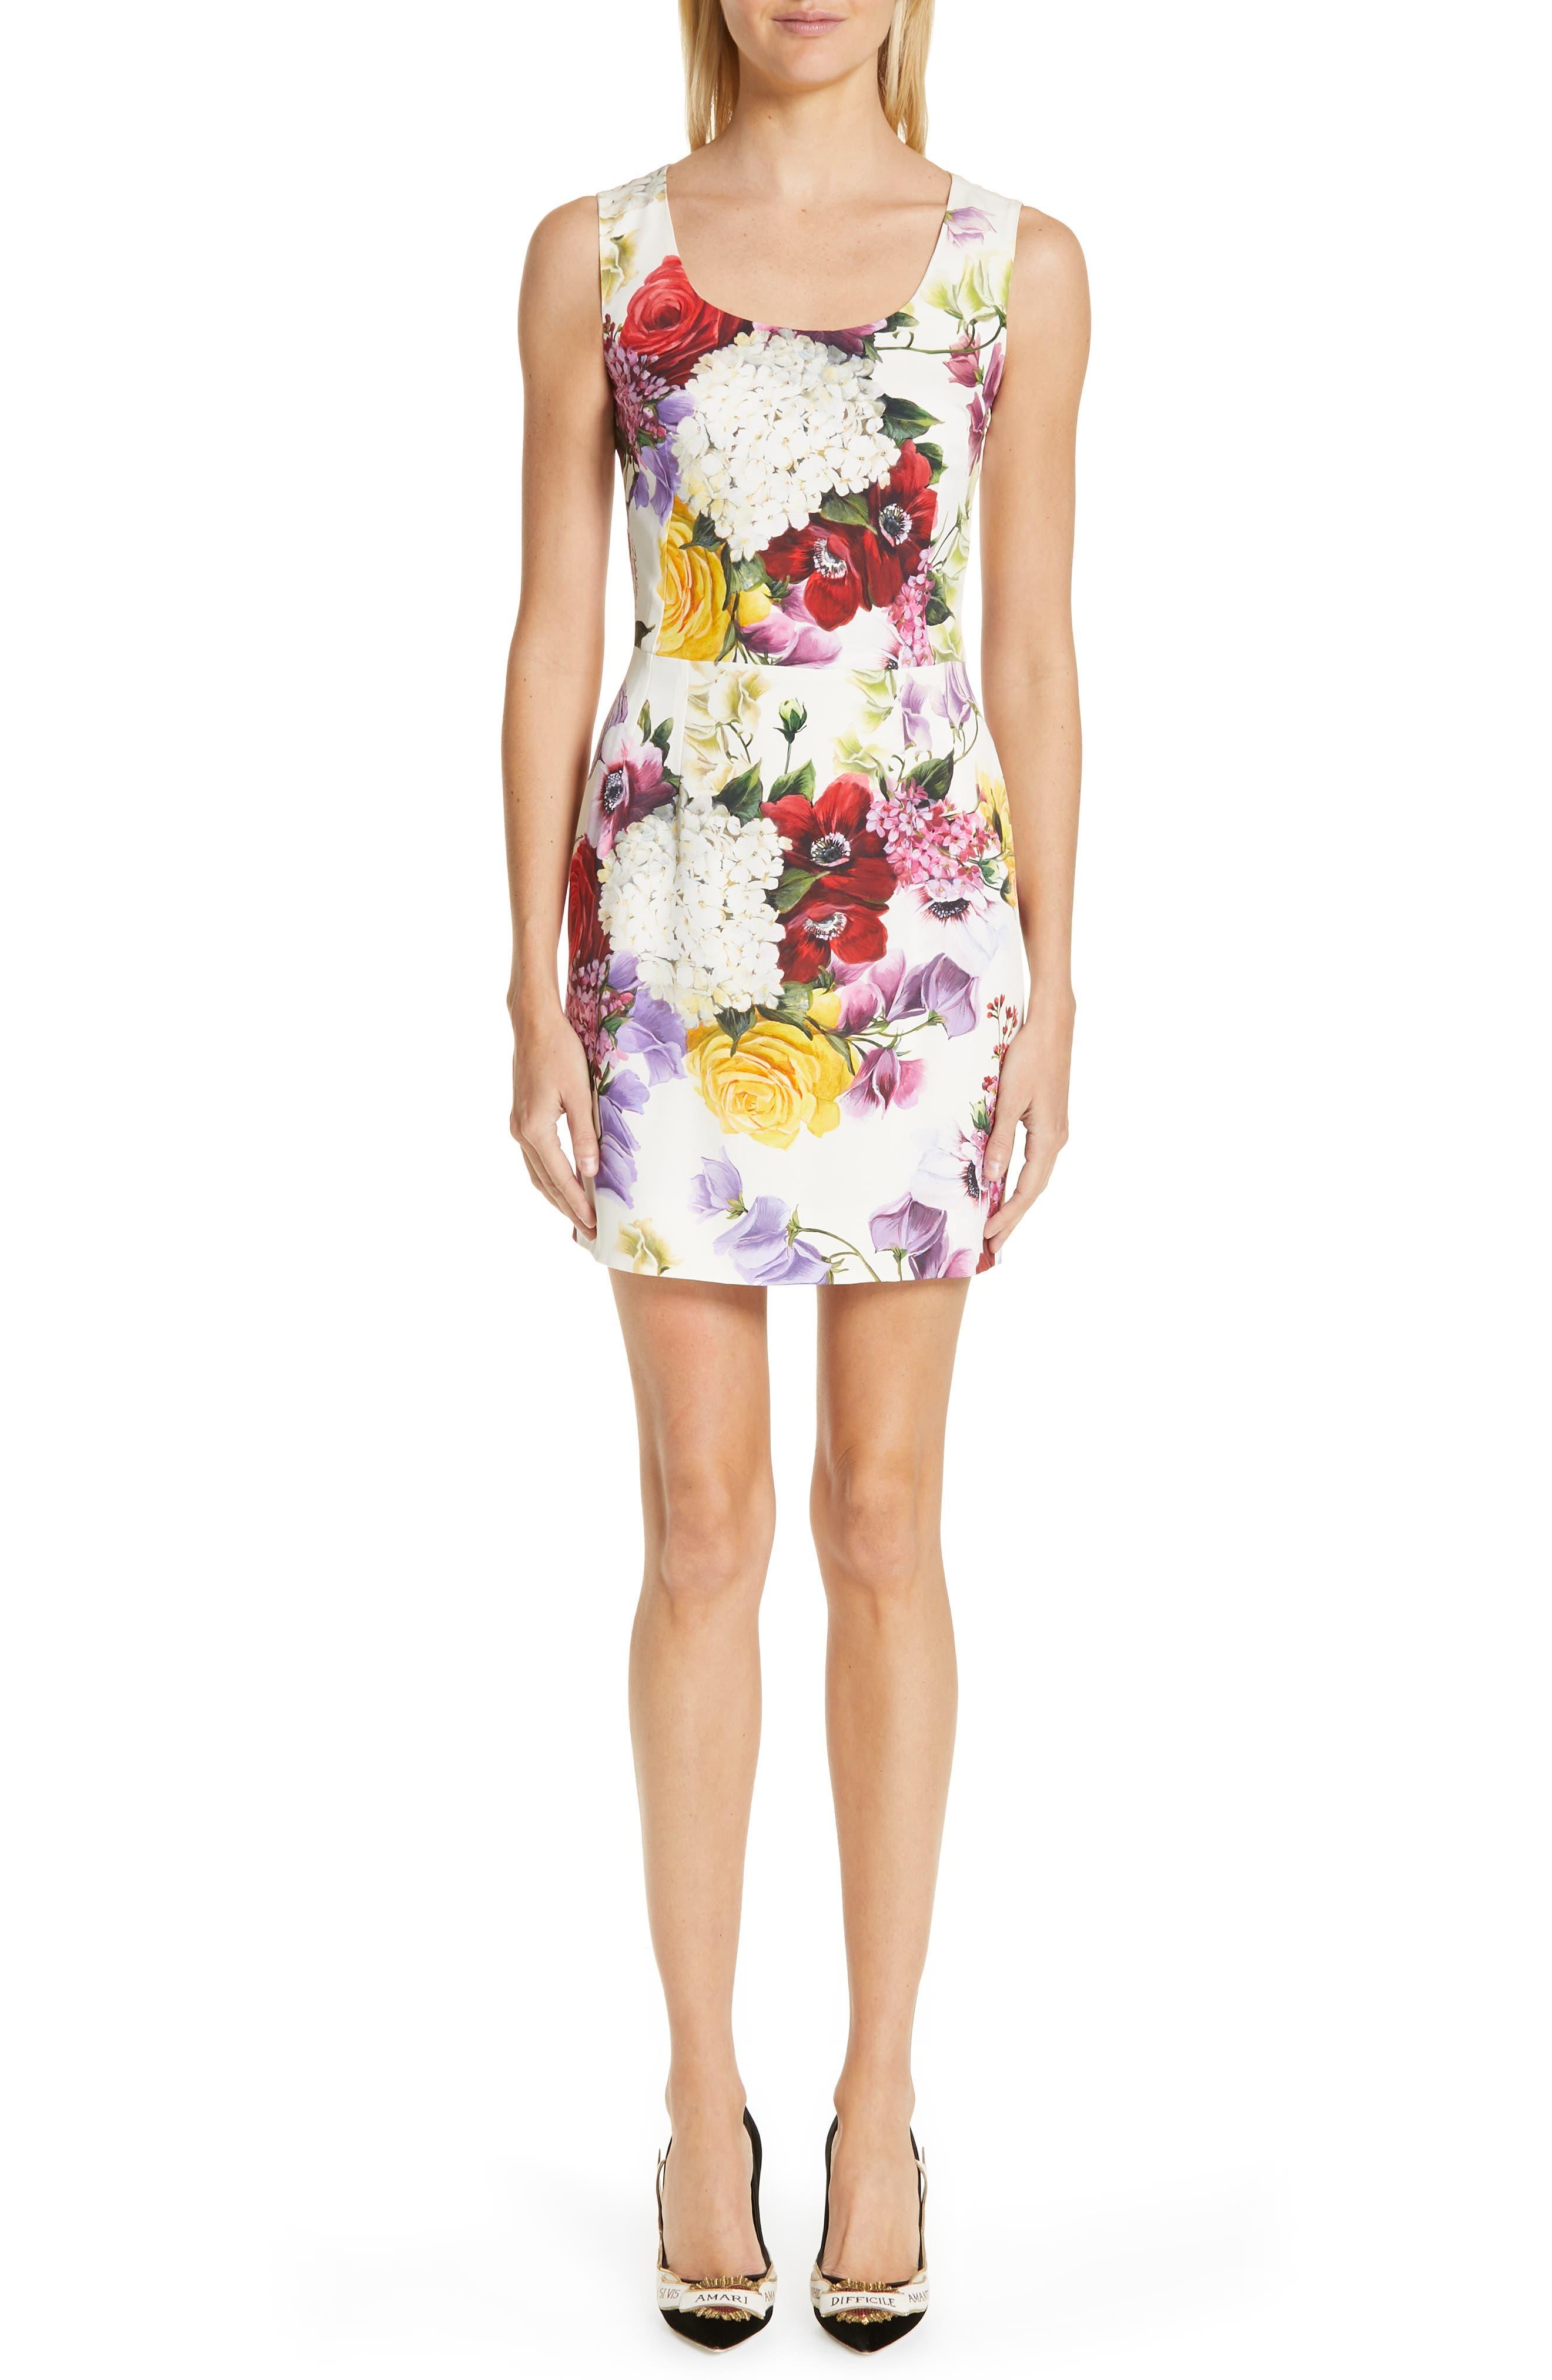 Dolce & gabbana Floral Print Stretch Silk Charmeuse Minidress